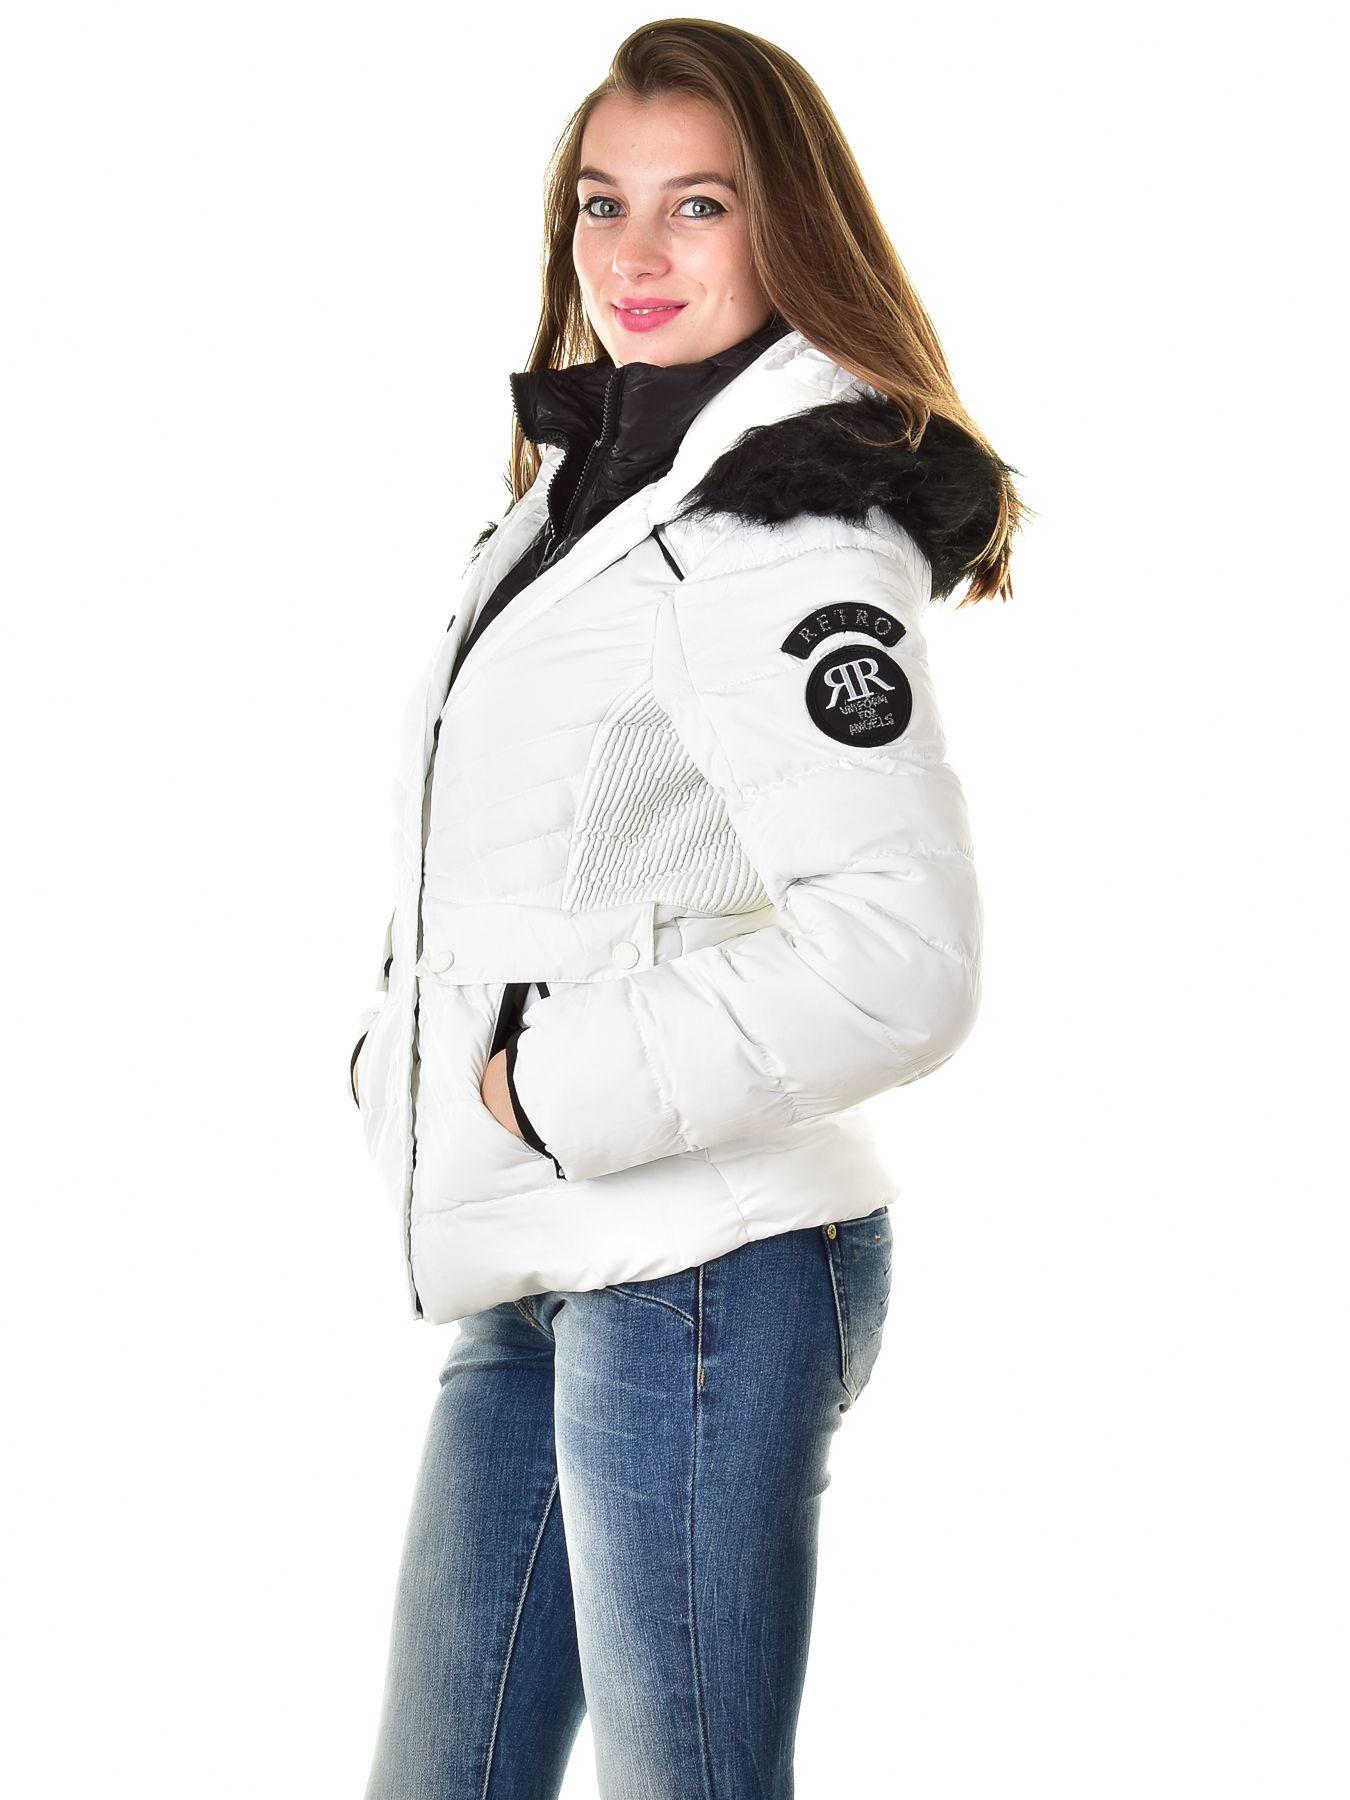 Retro Jeans női kabát NOEMIE | Markasbolt.hu Hivatalos RETRO